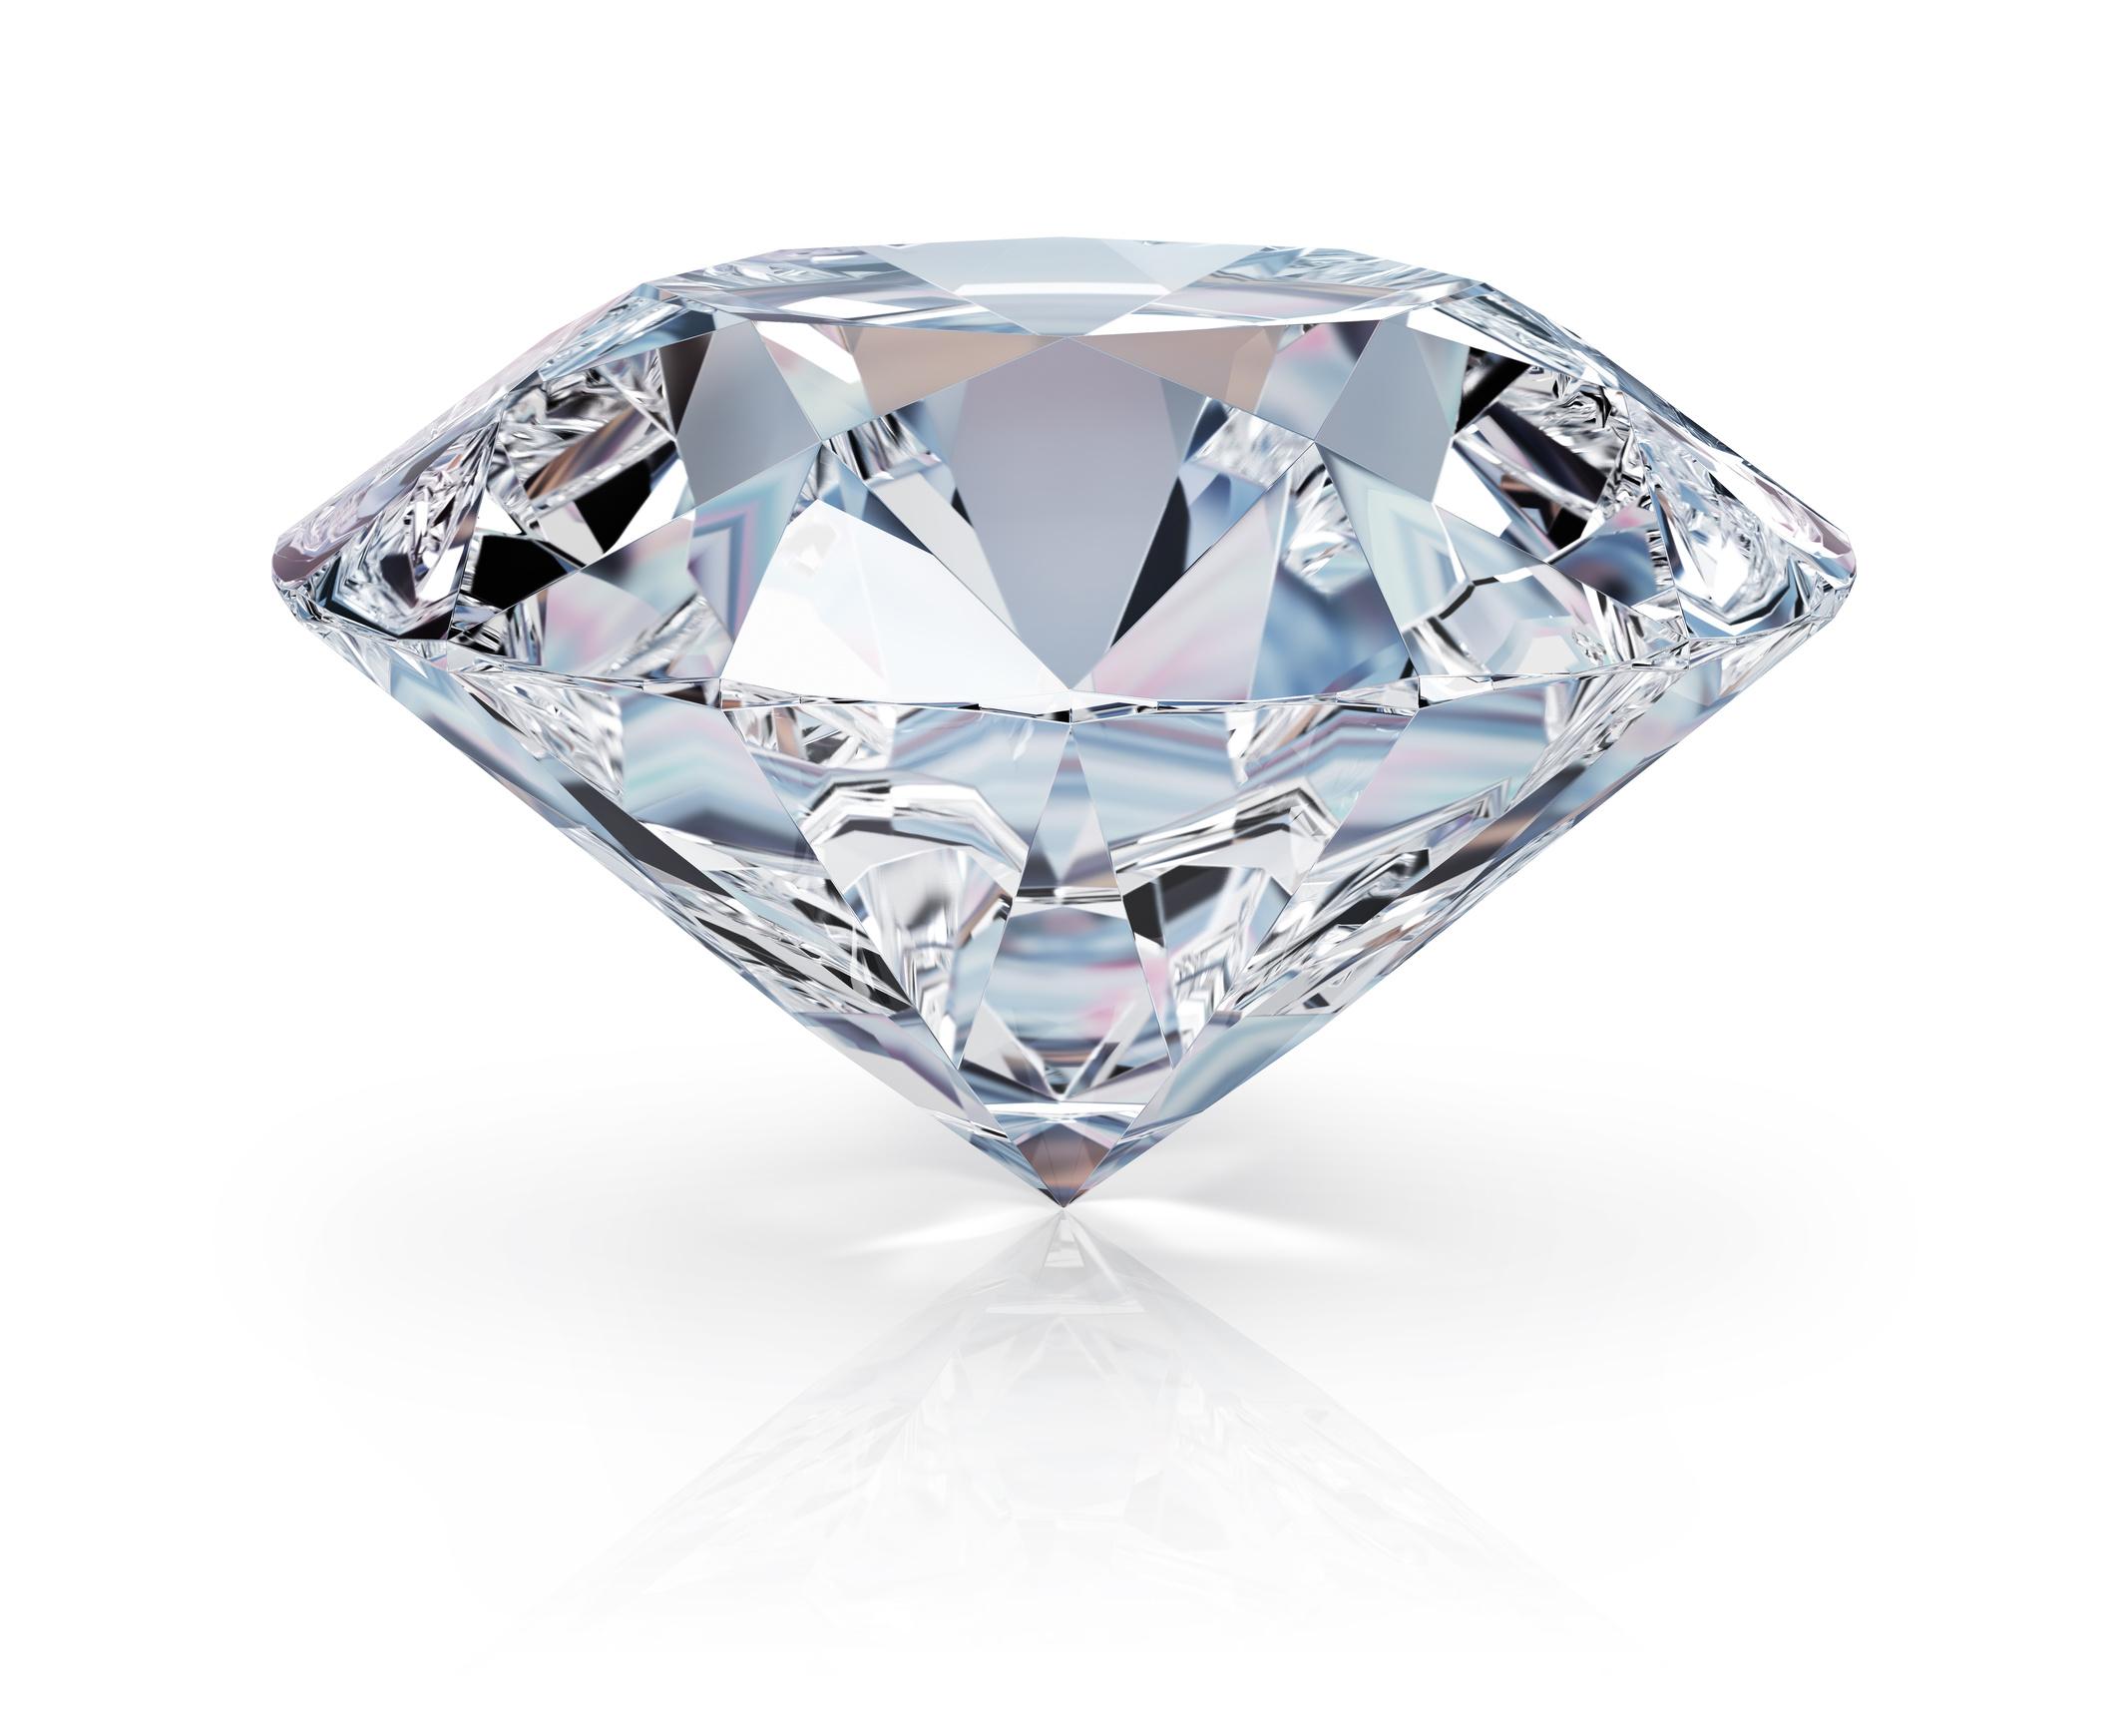 Diamond Education: The 4 C's - Jodie Gearing